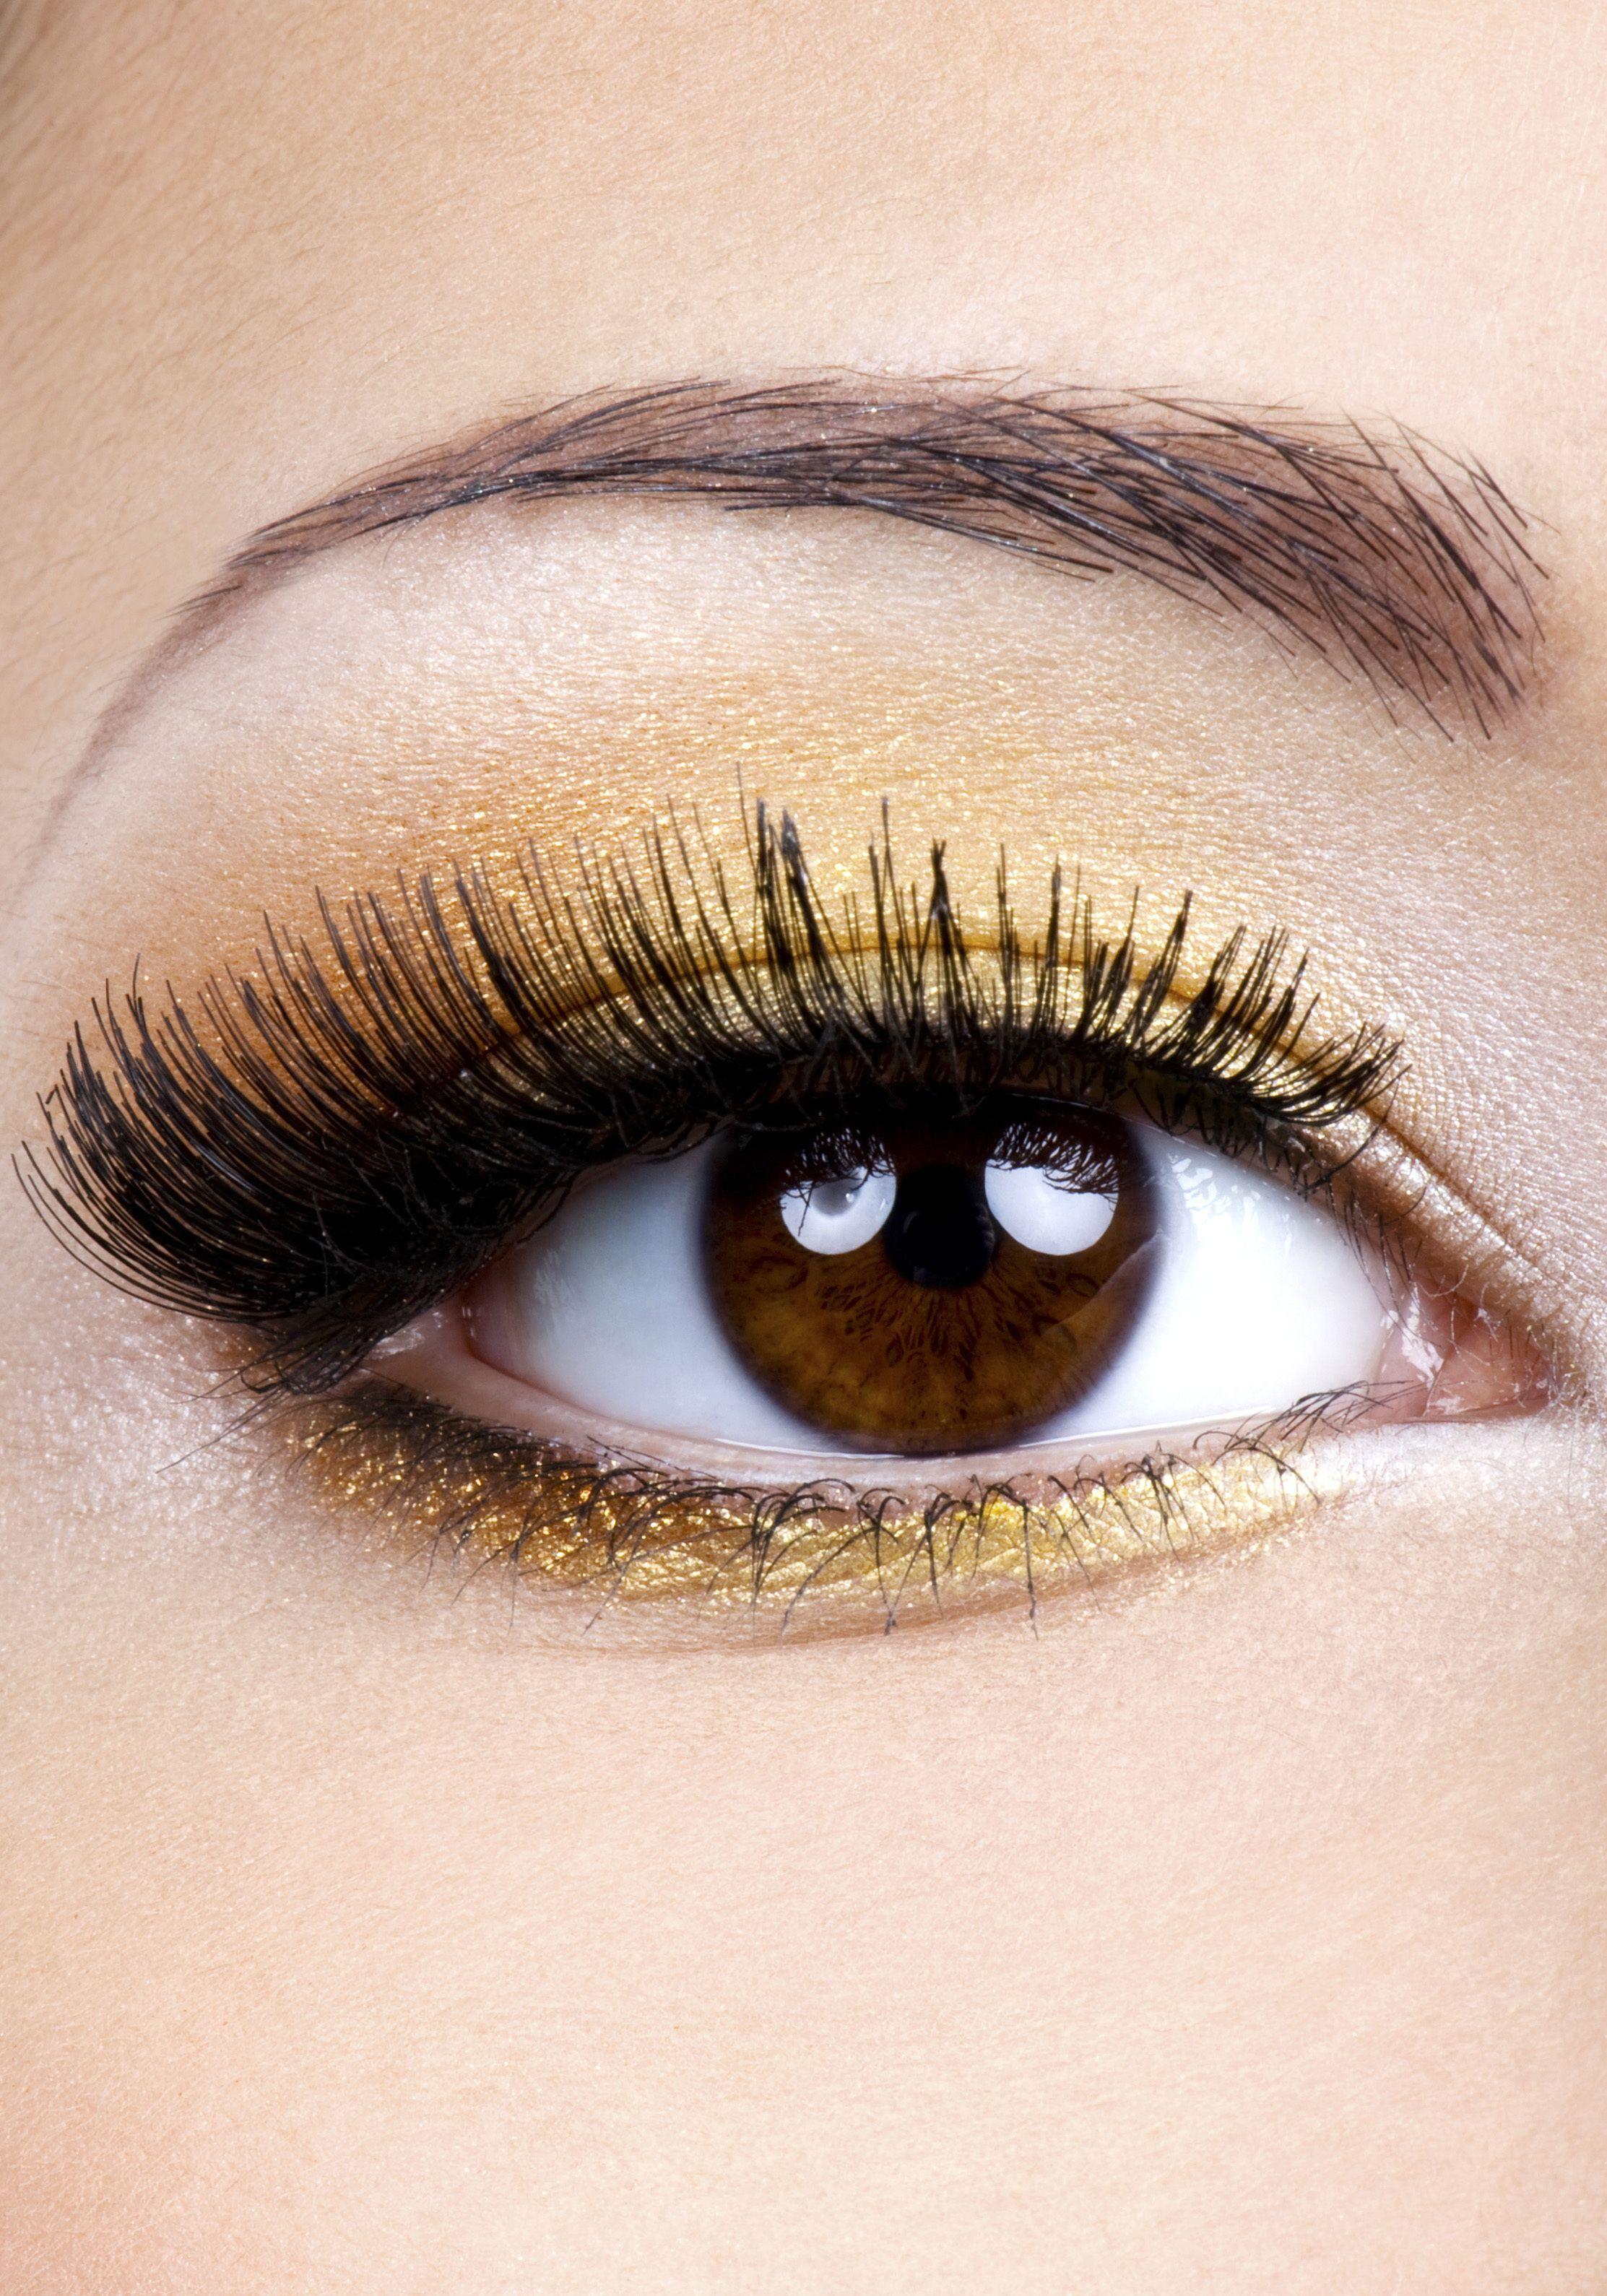 Full Set of Mink or Silk Eyelash Extensions | San Antonio Daily ...